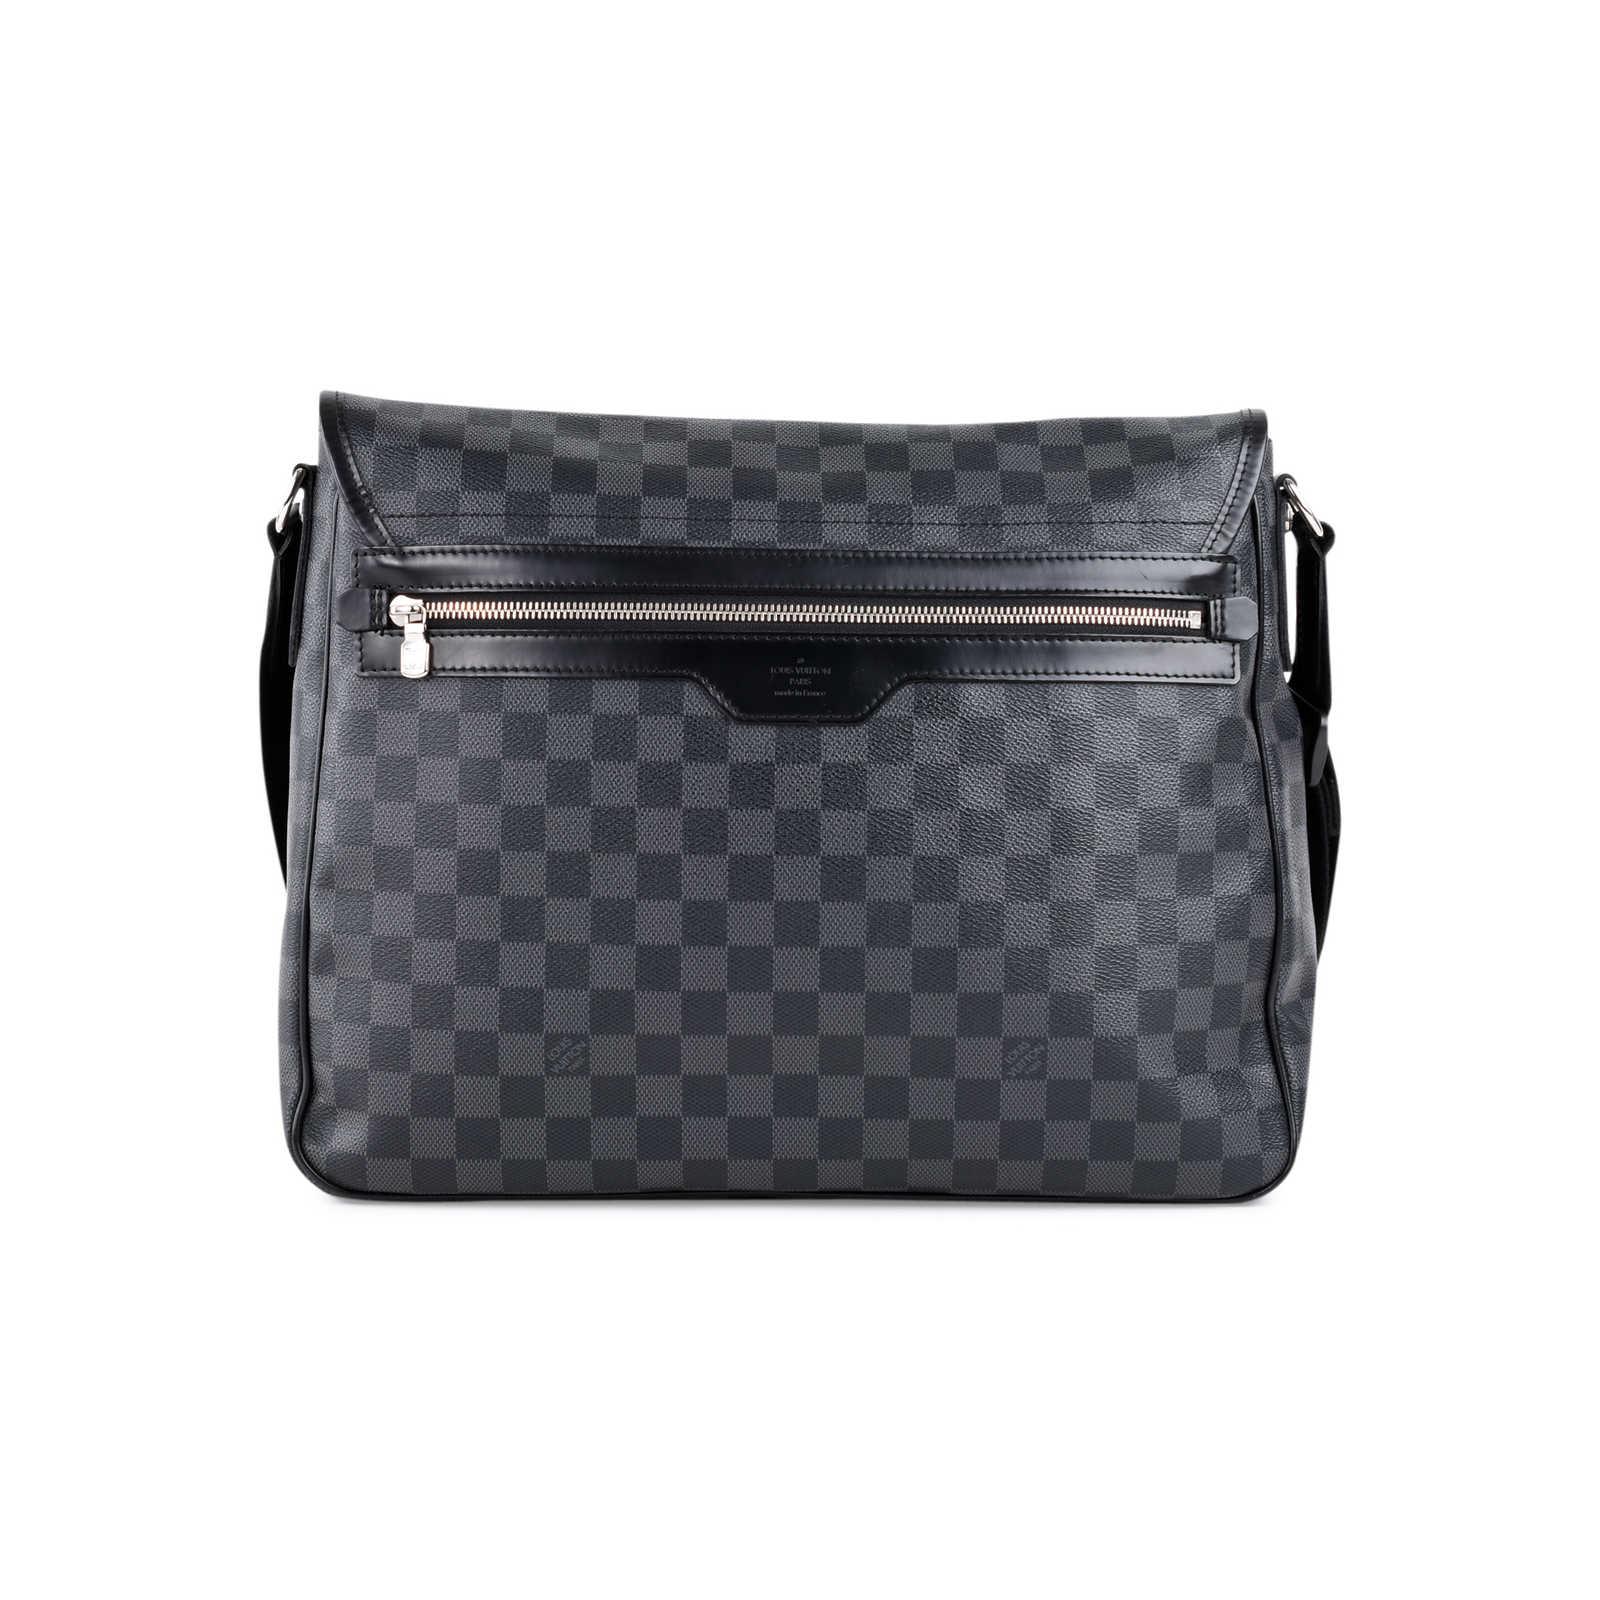 fa5accd4a657 ... Authentic Second Hand Louis Vuitton Damier Graphite Laptop Renzo  Messenger (PSS-462-00023 ...